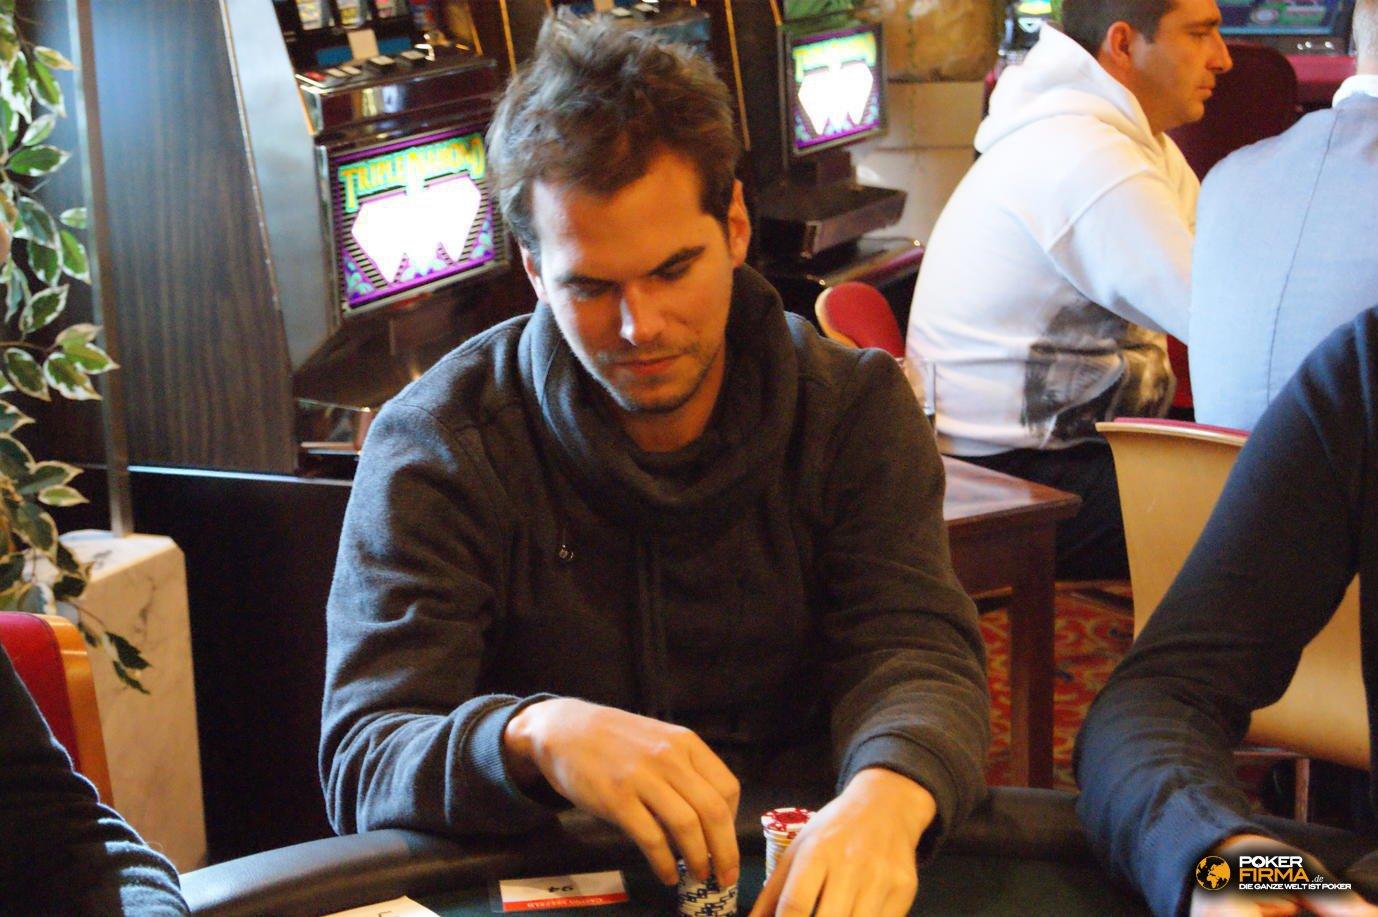 Mountain_Poker_Party_1500_NLH_081011_Simon_Mertlitsch